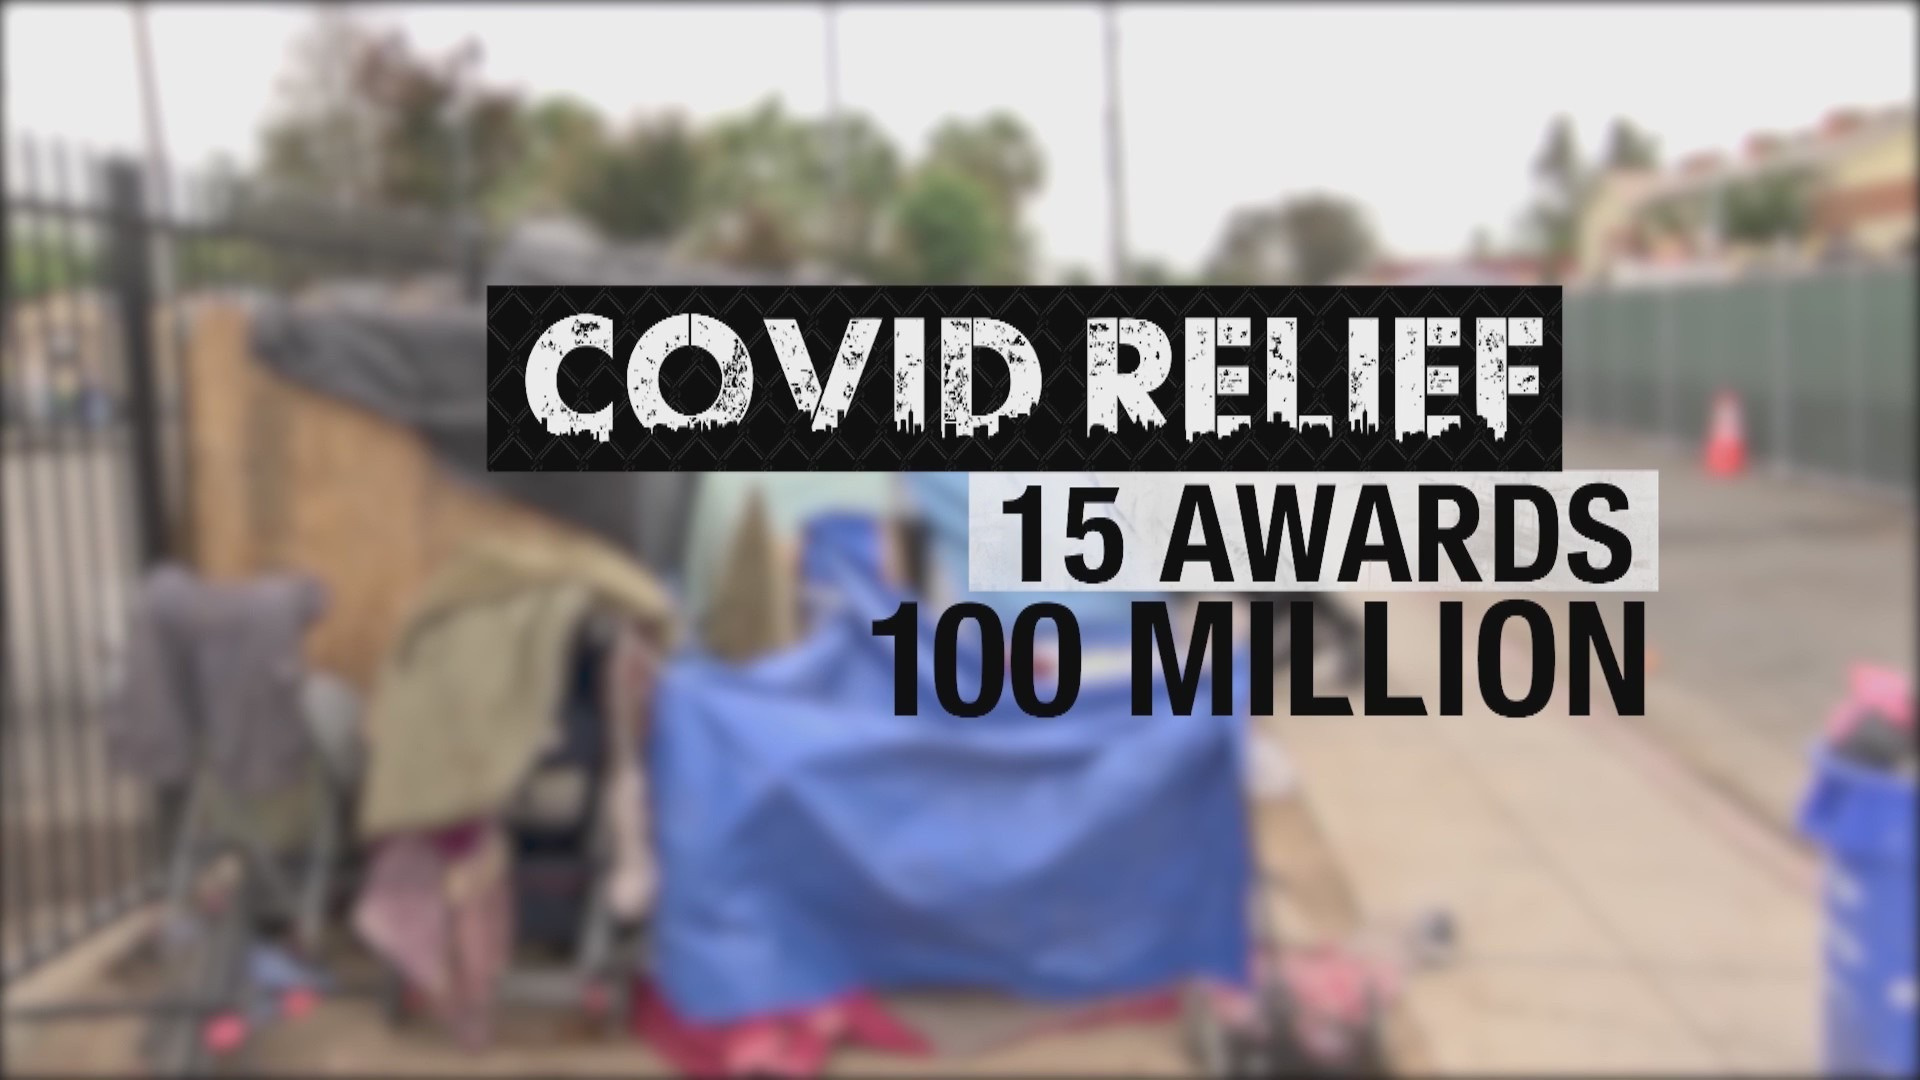 $100M in homeless funding in Fresno, tens of millions yet to be spent